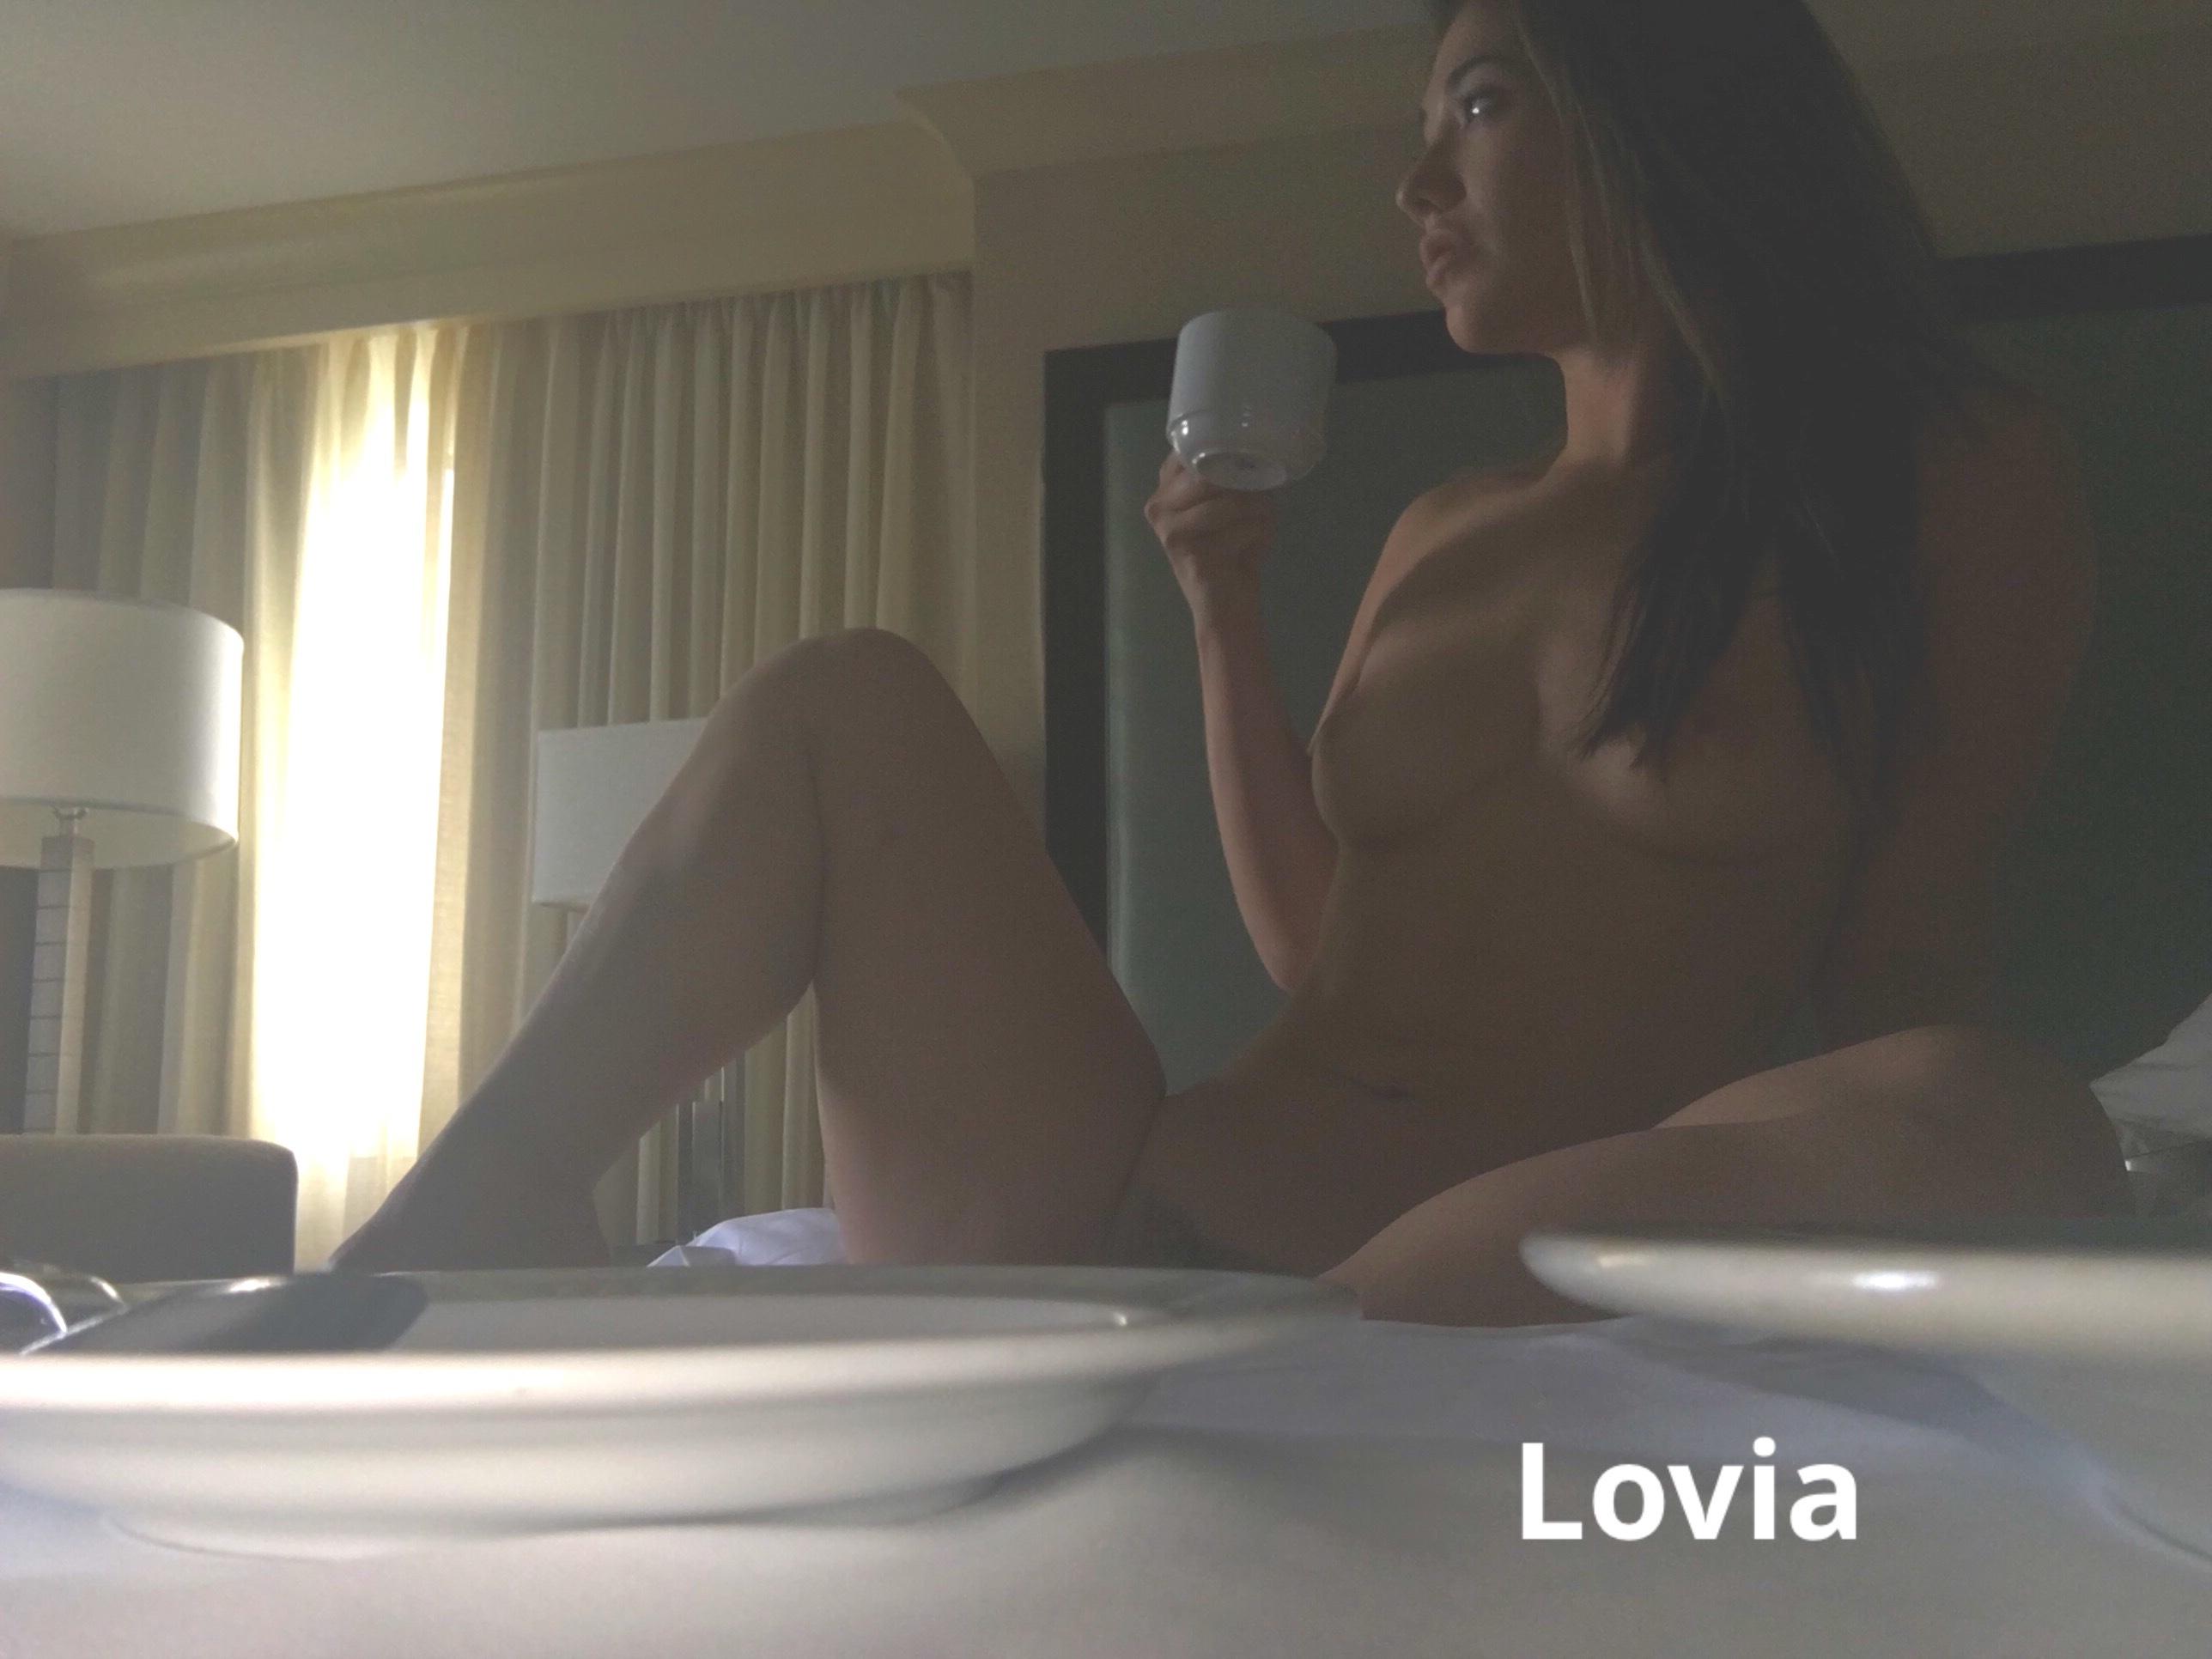 Eva Lovia, Fallinlovia, Onlyfans 0318